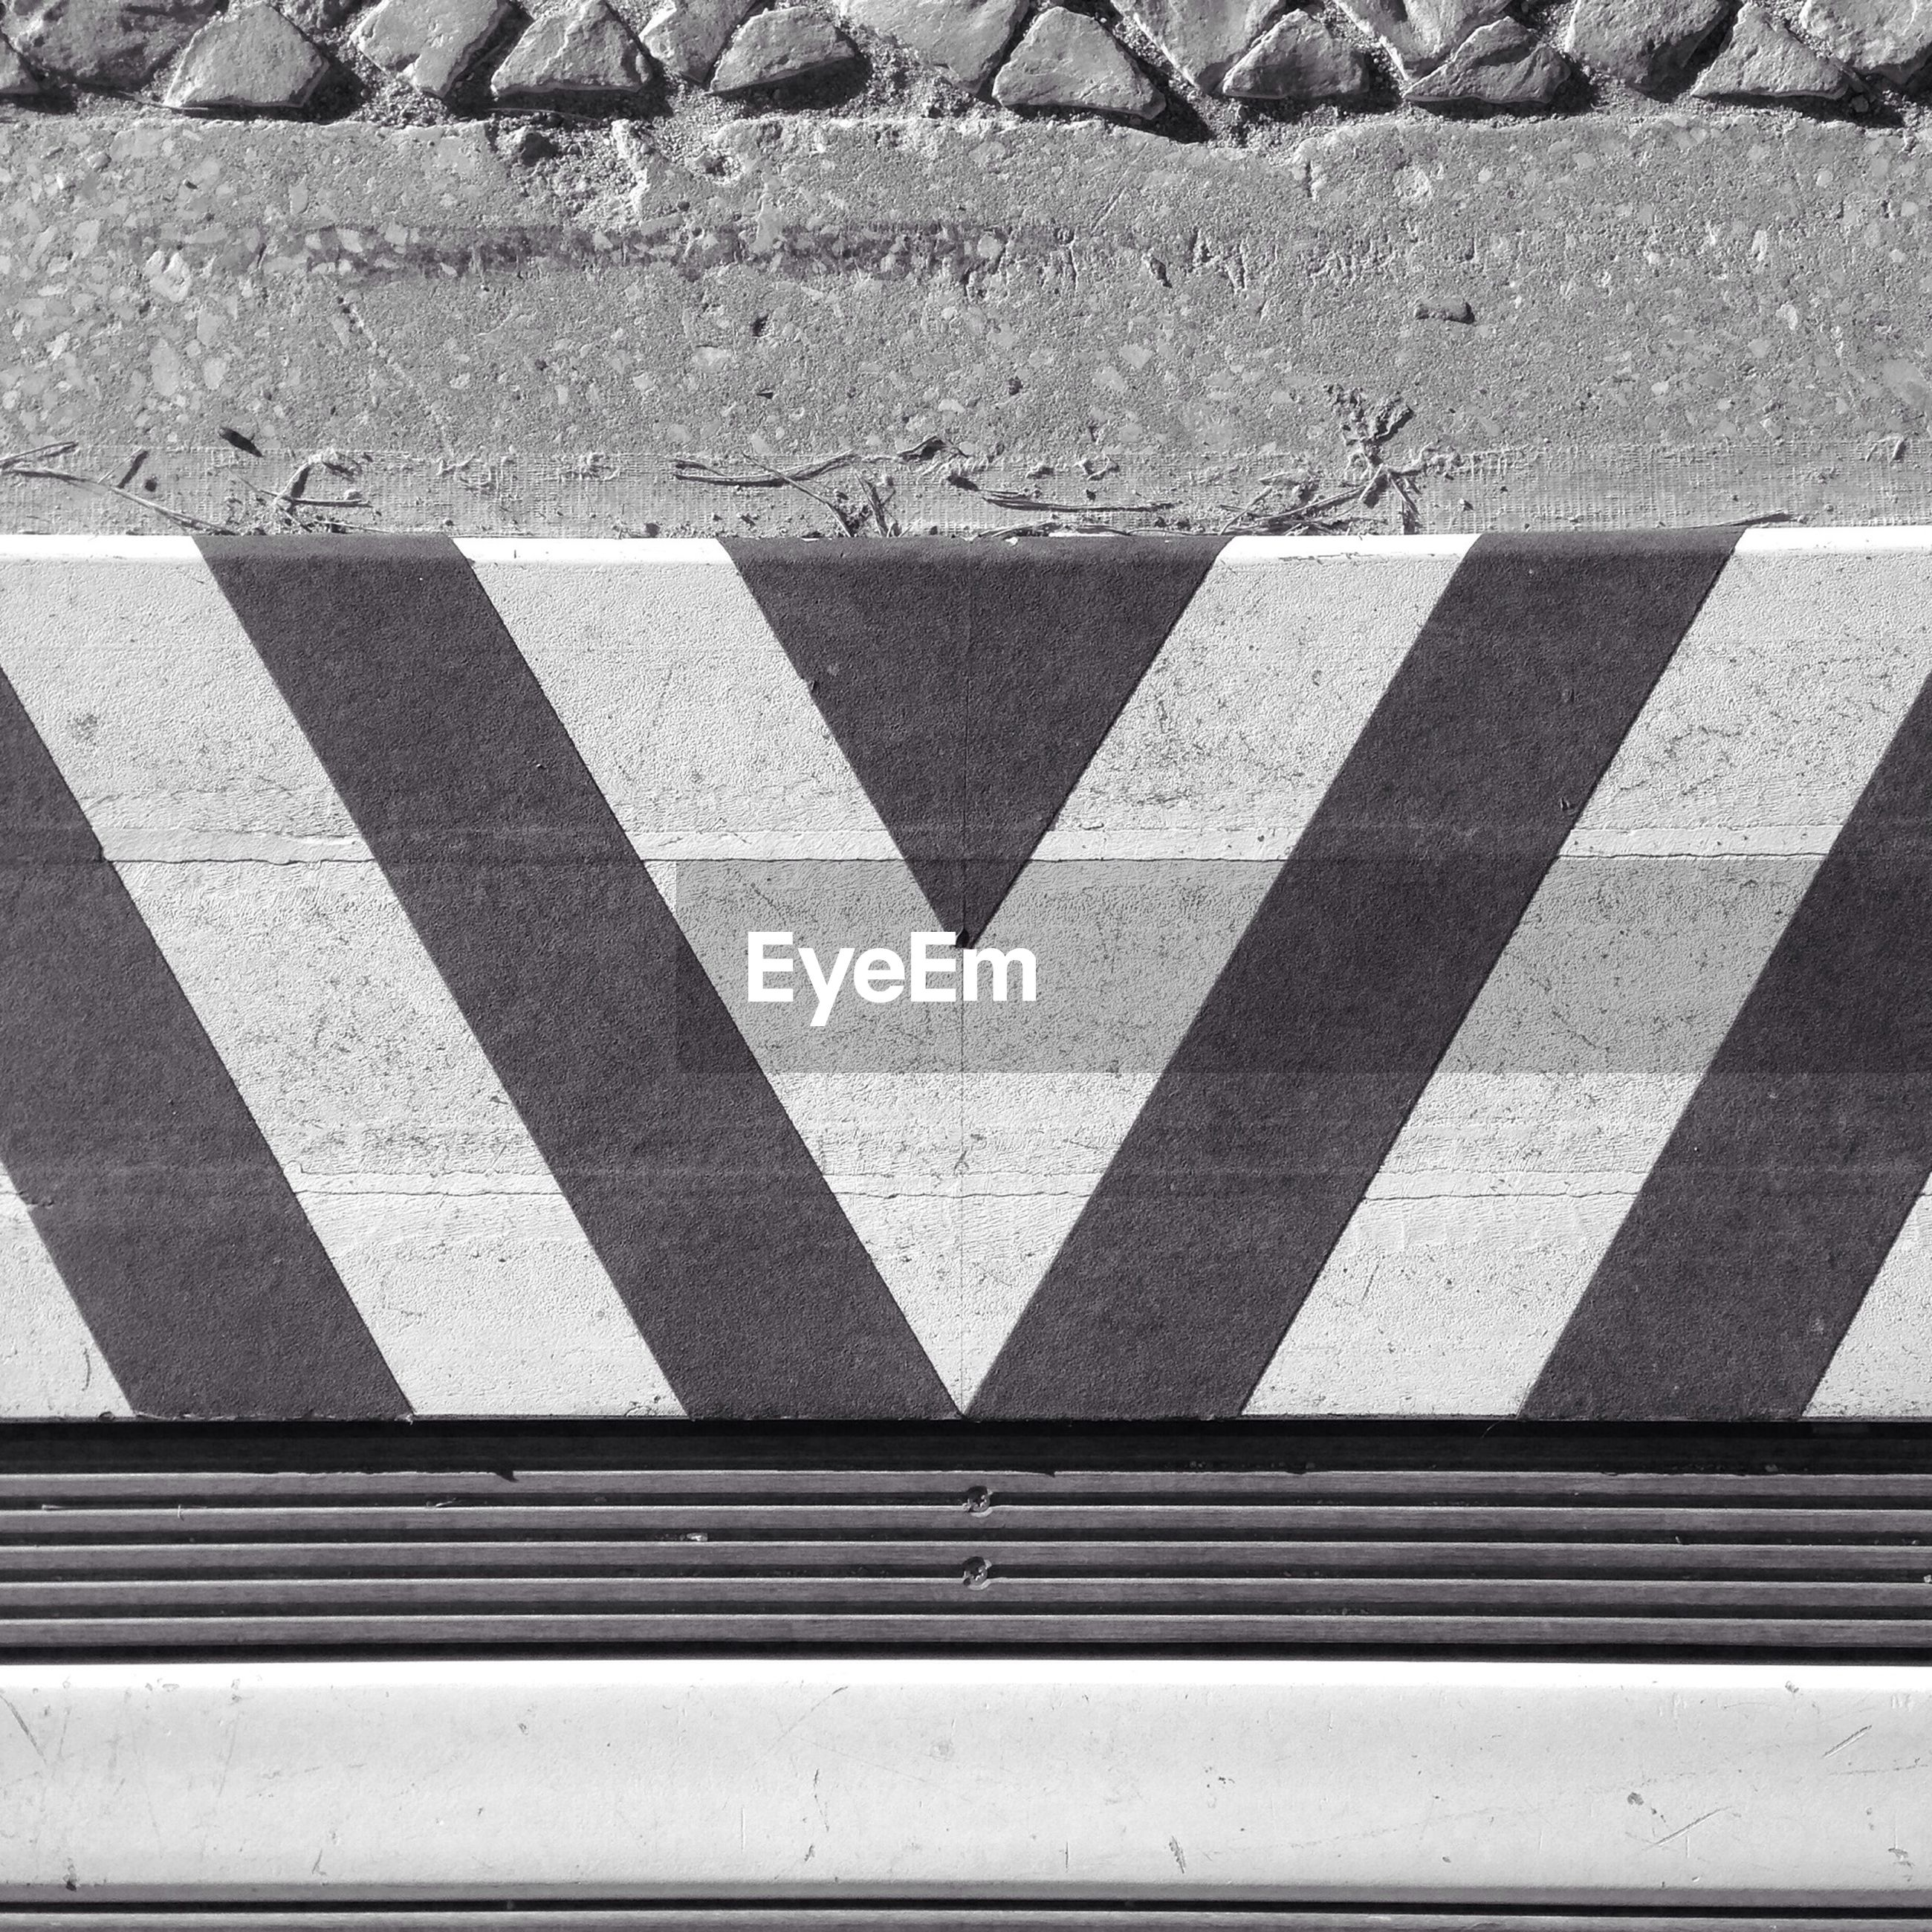 Divider by street